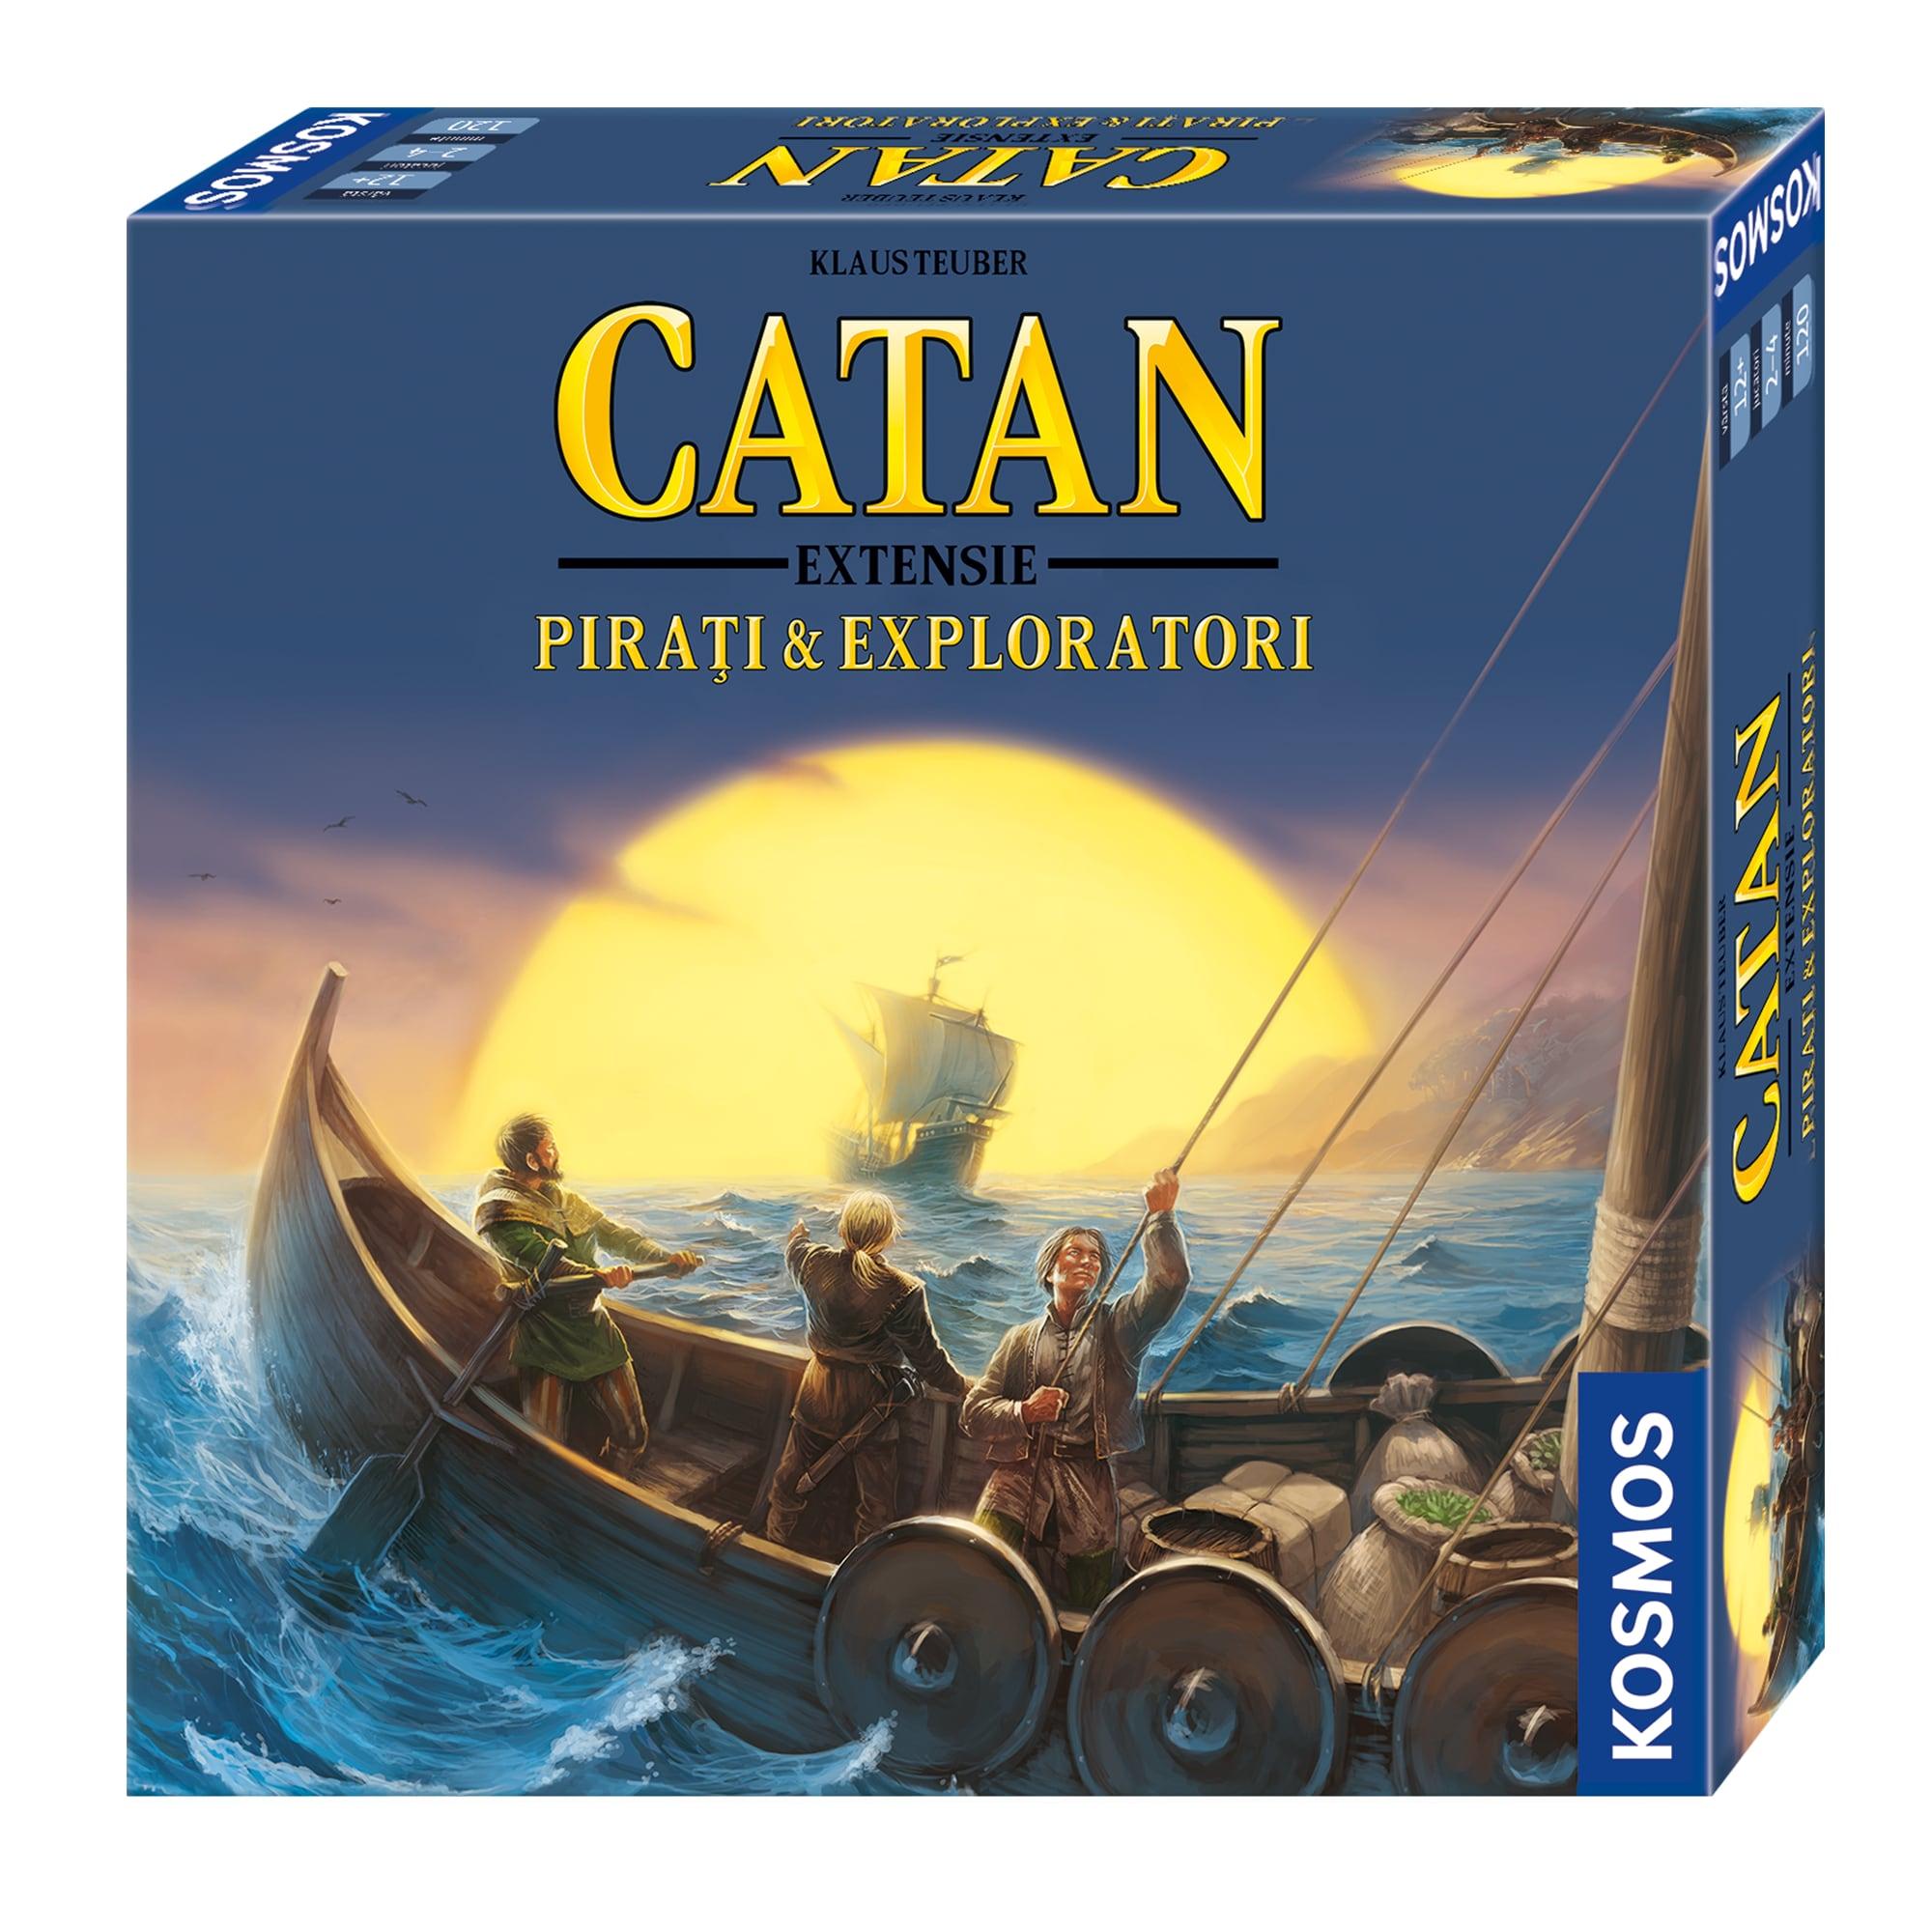 Fotografie Joc de societate Kosmos Catan, Pirati & Exploratori, extensie